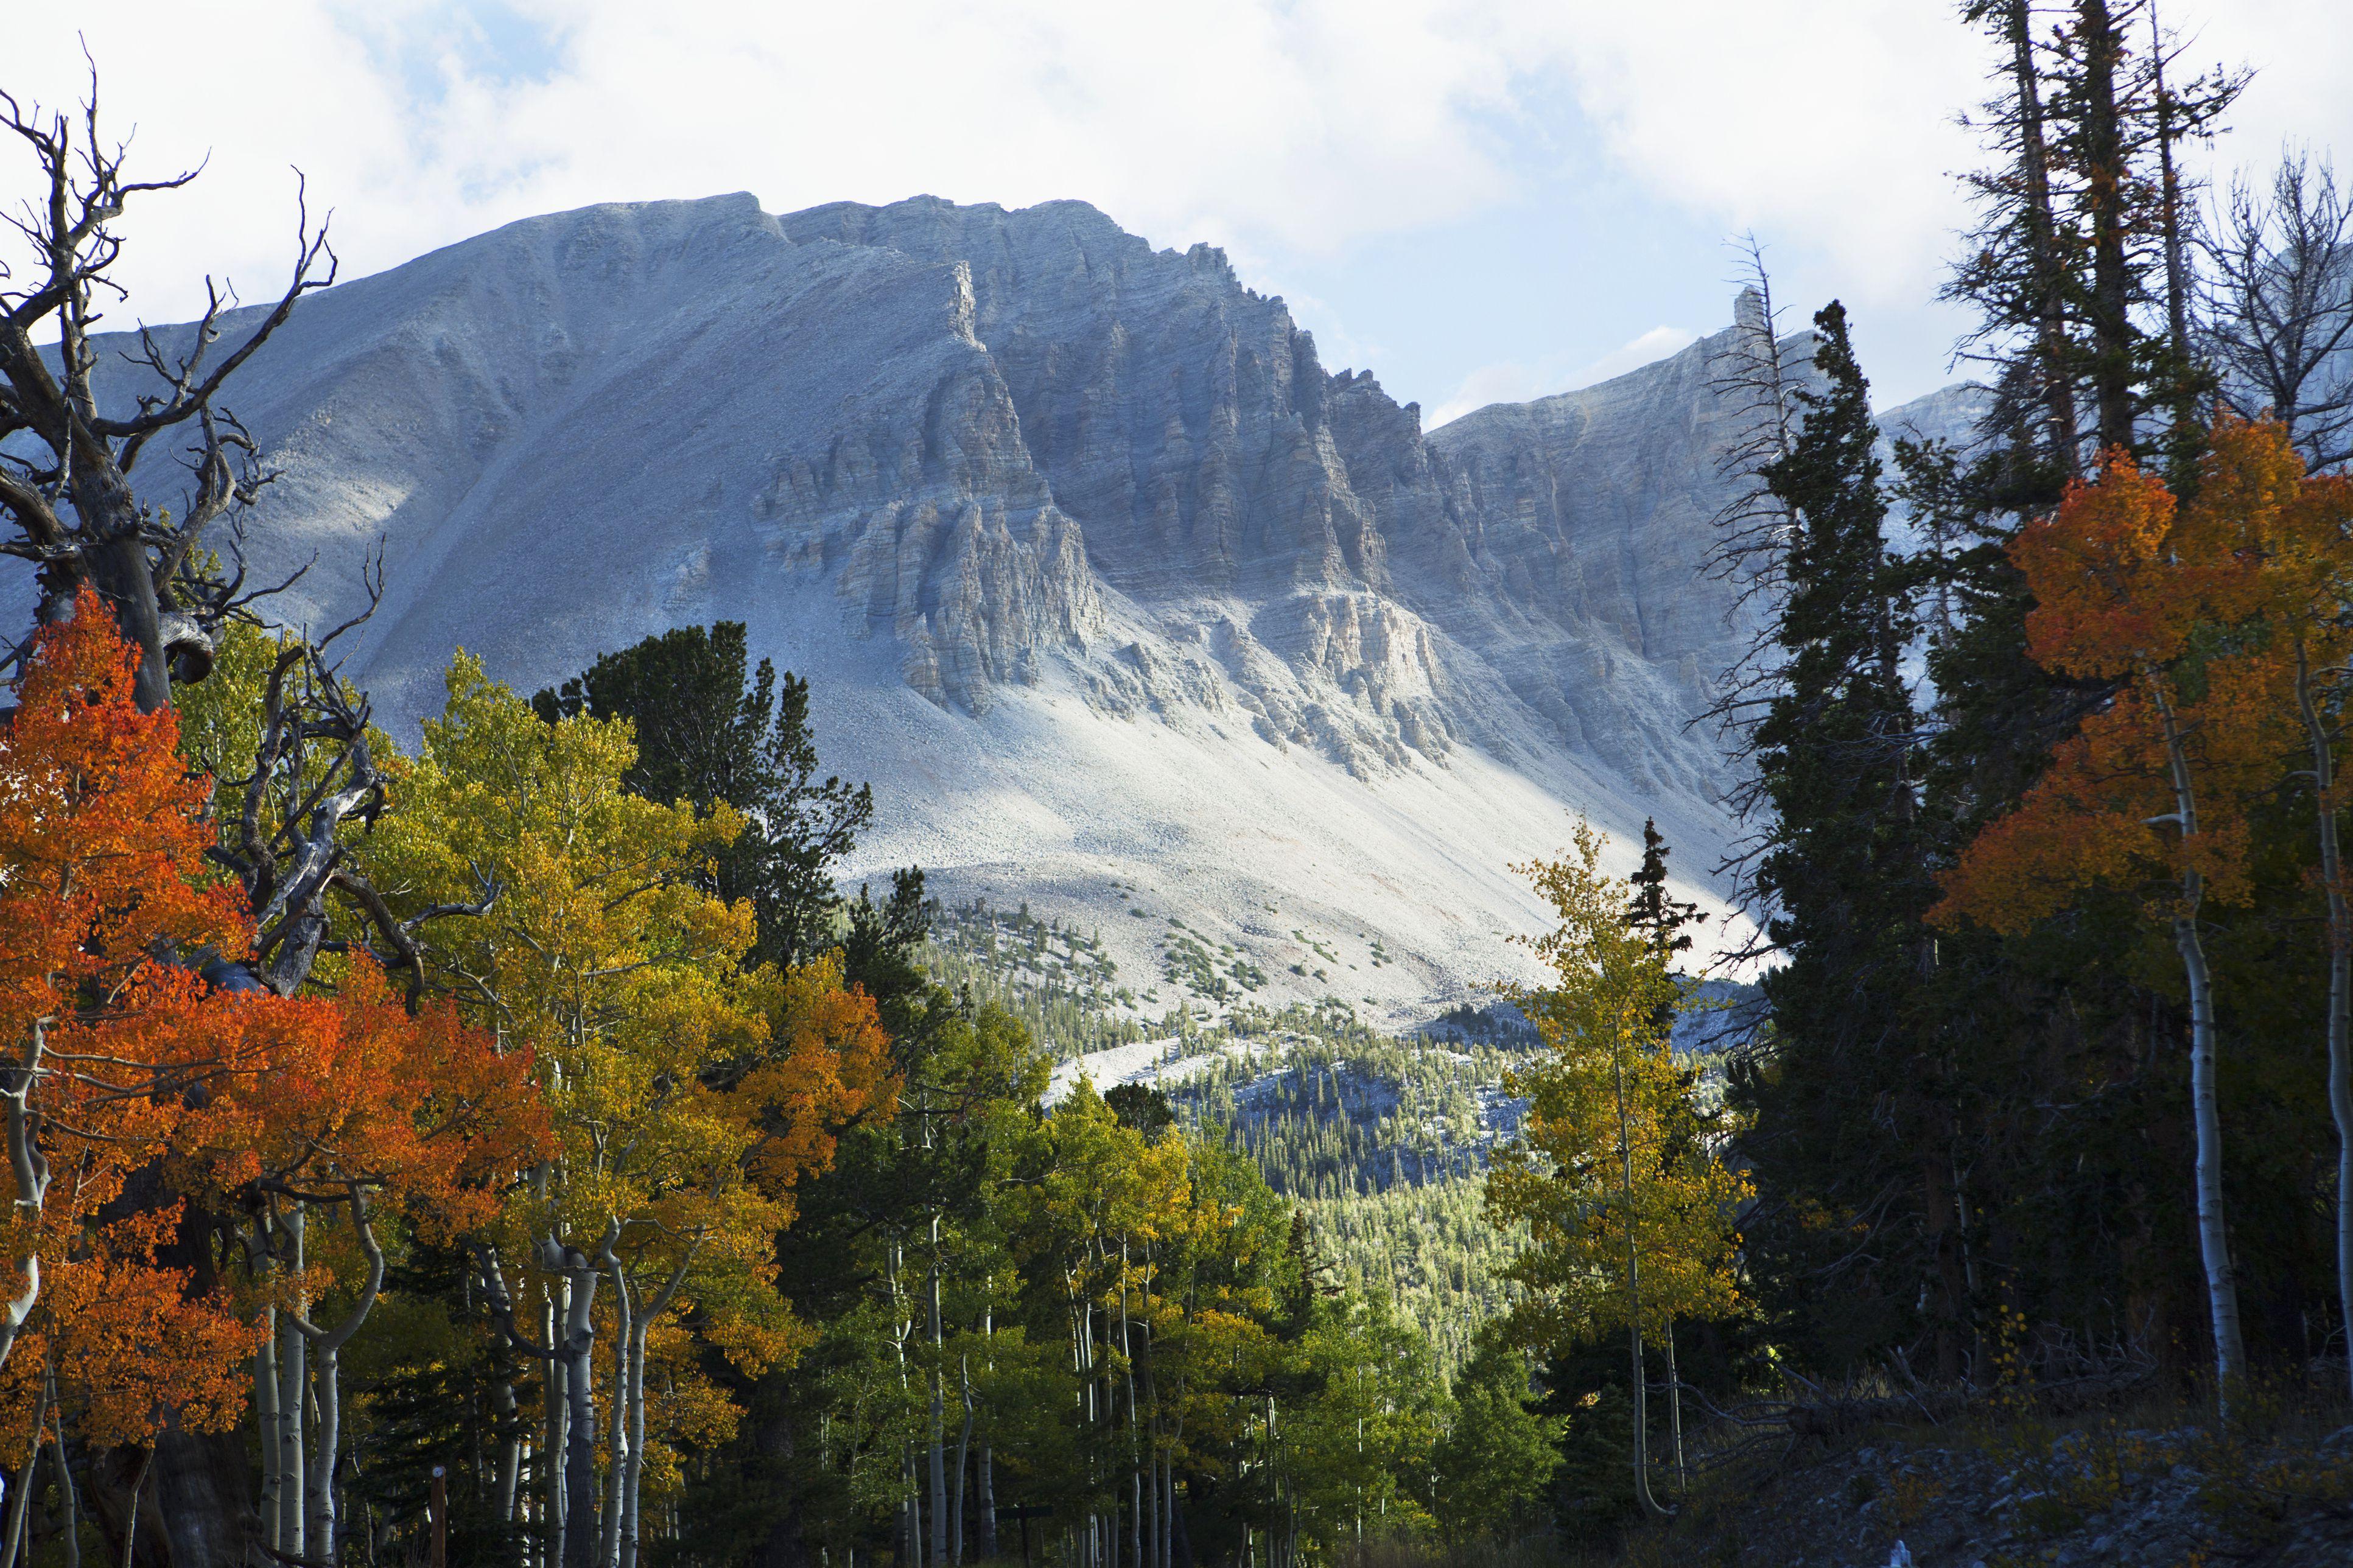 Wheeler Peak overlook from Wheeler Peak scenic drive, Great Basin National Park